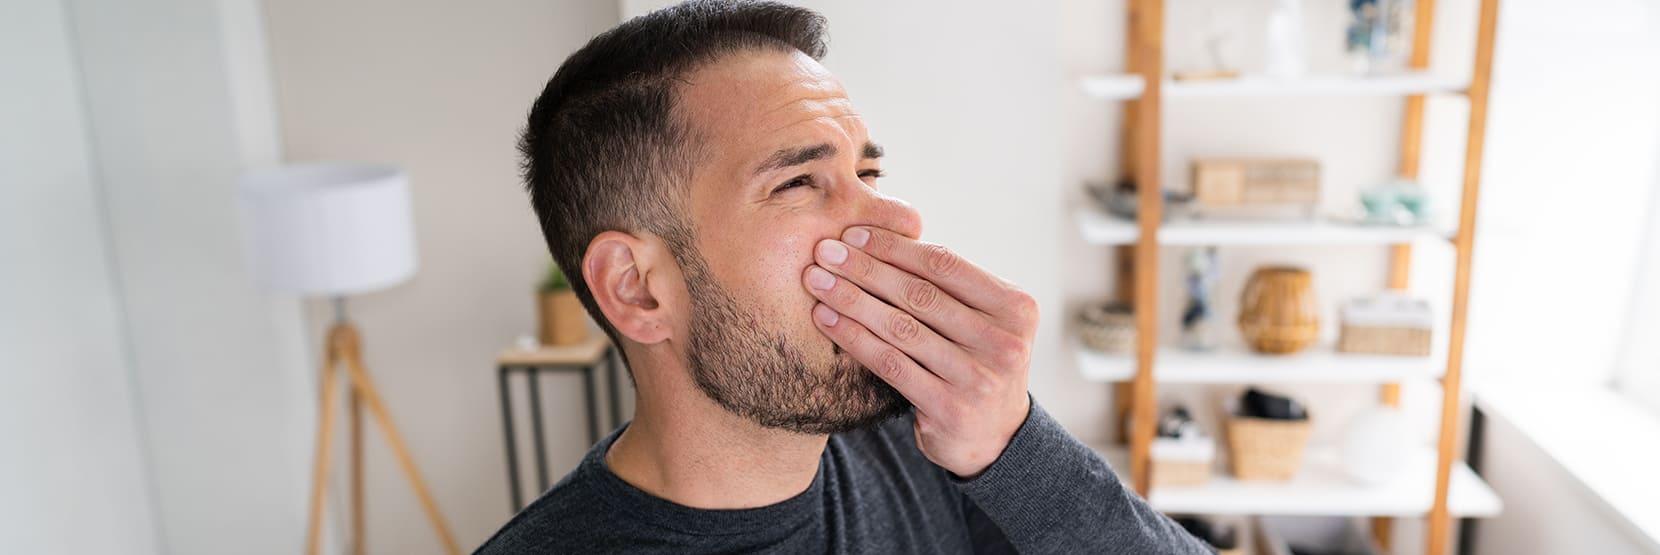 Hoe kom je van een muffe geur in huis af?